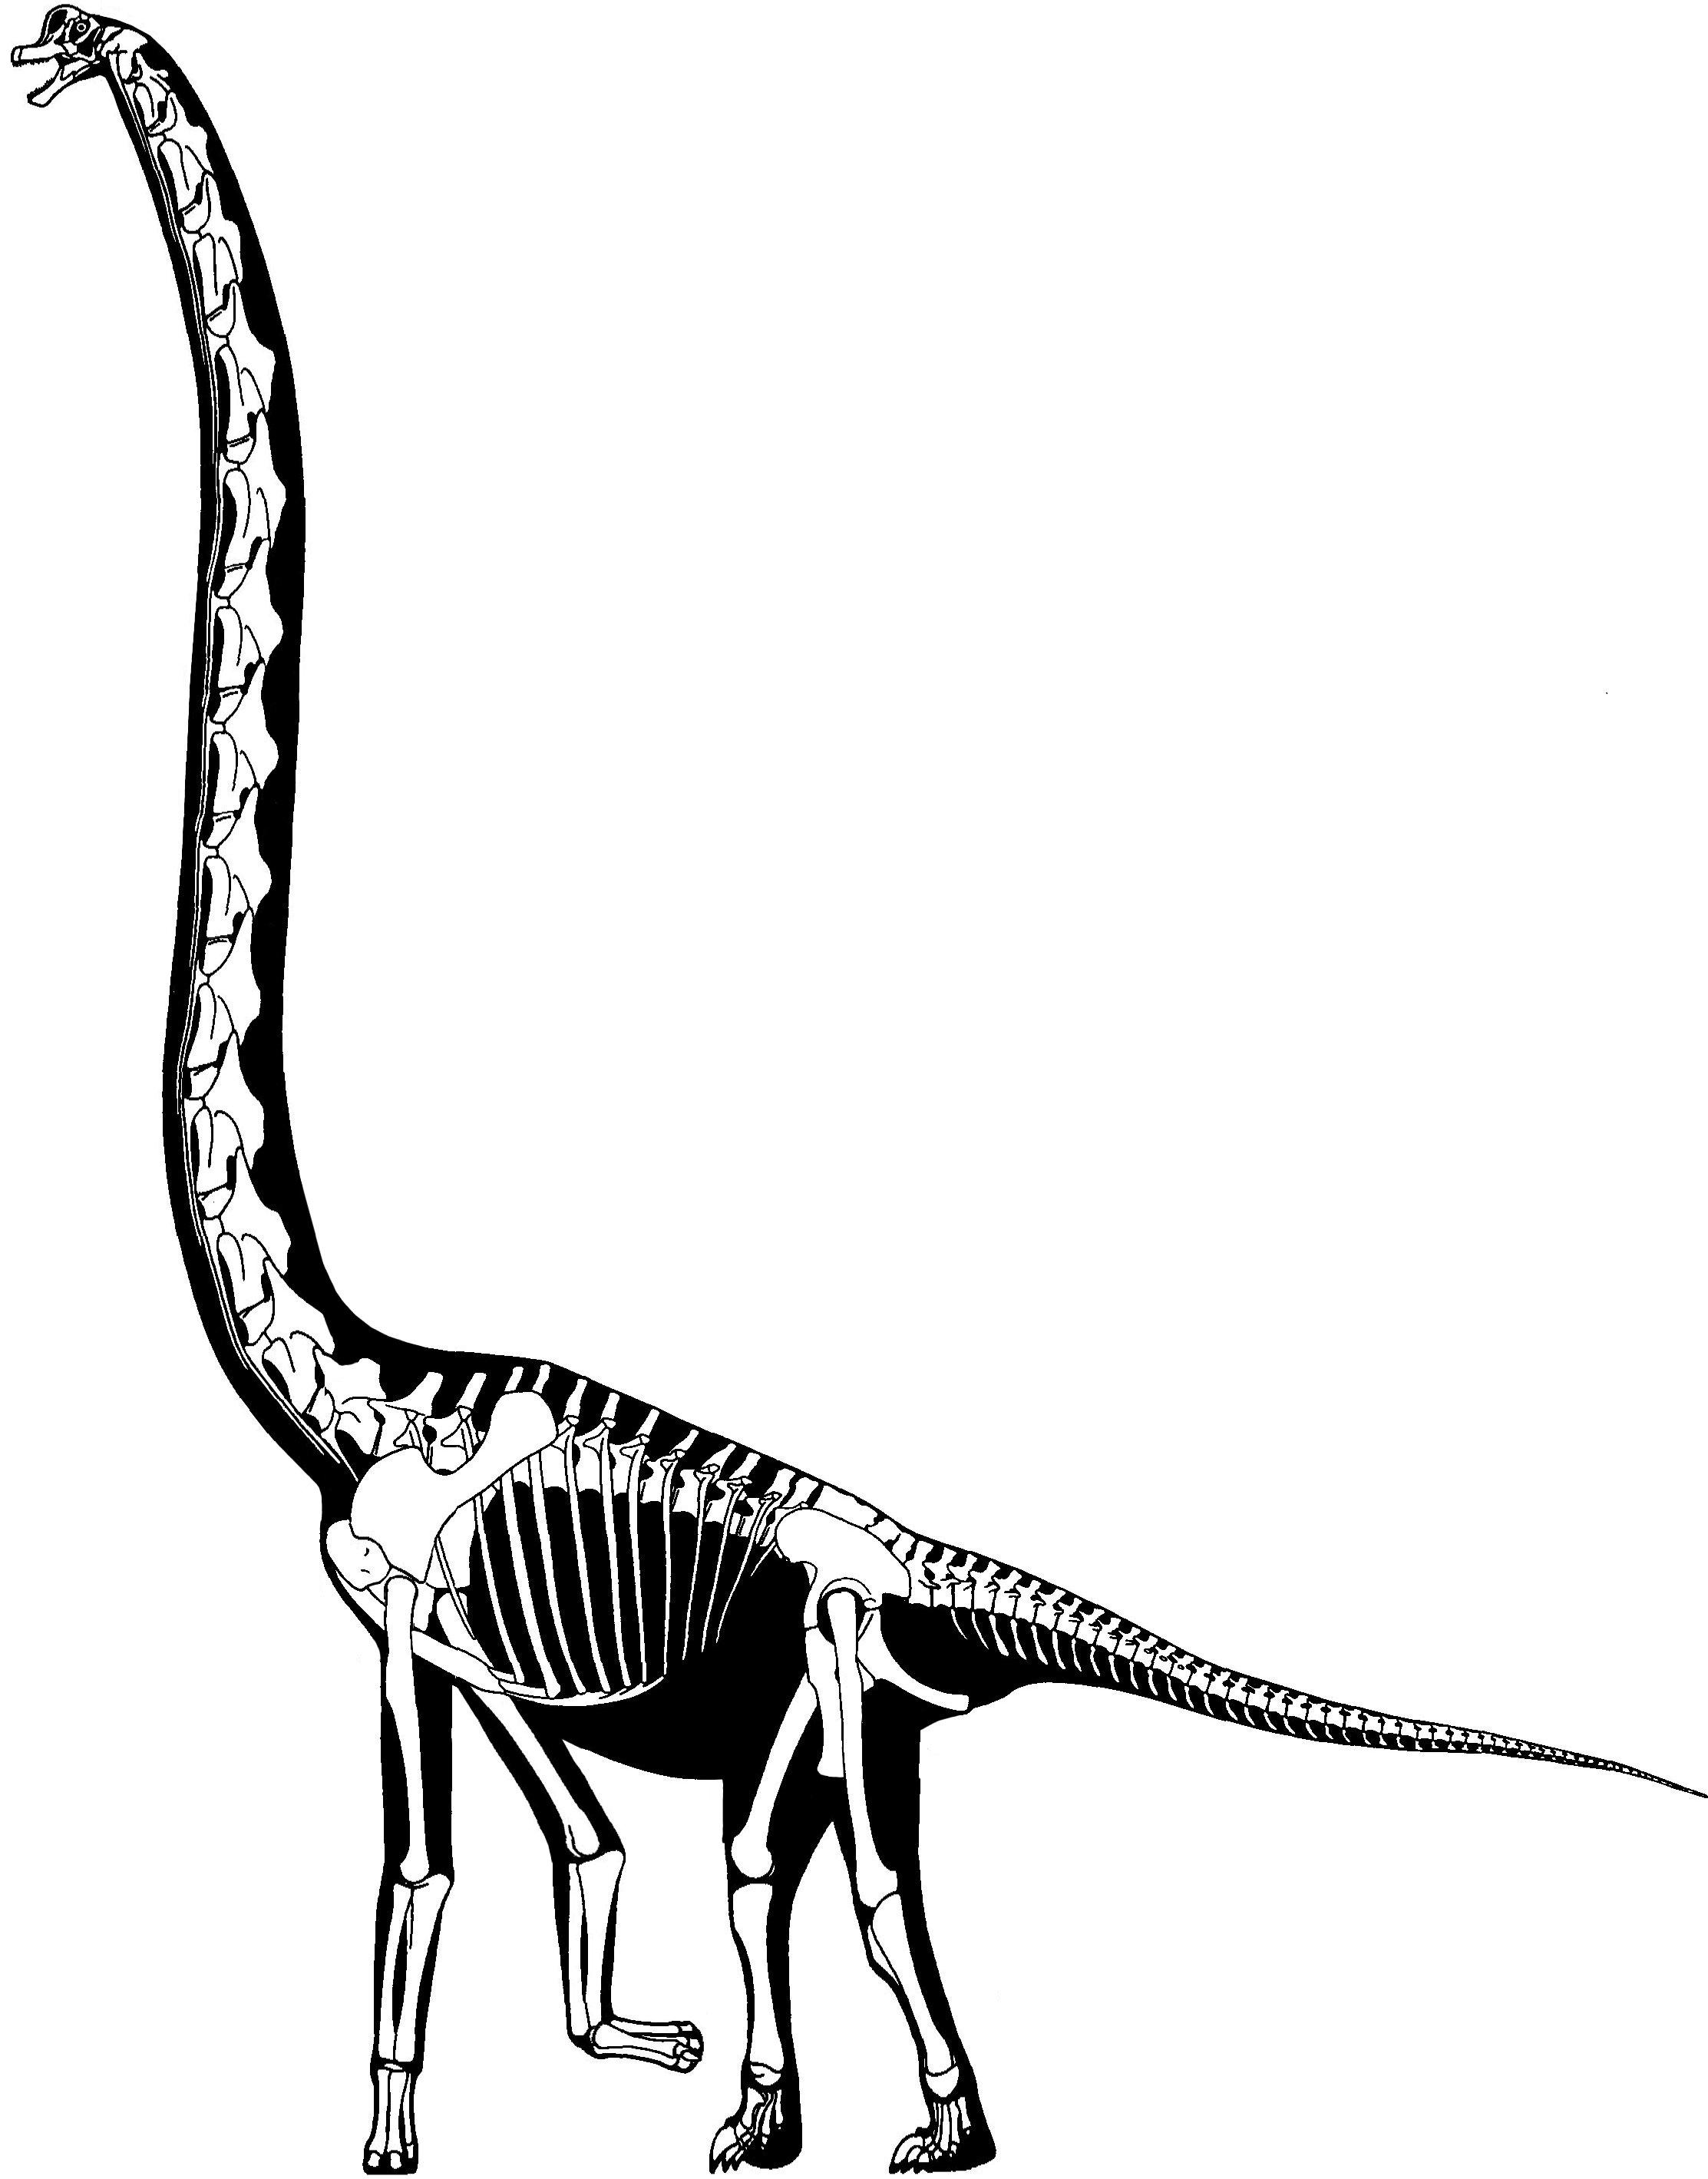 2225x2838 How Tallweird Was Sauroposeidon Sauropod Vertebra Picture